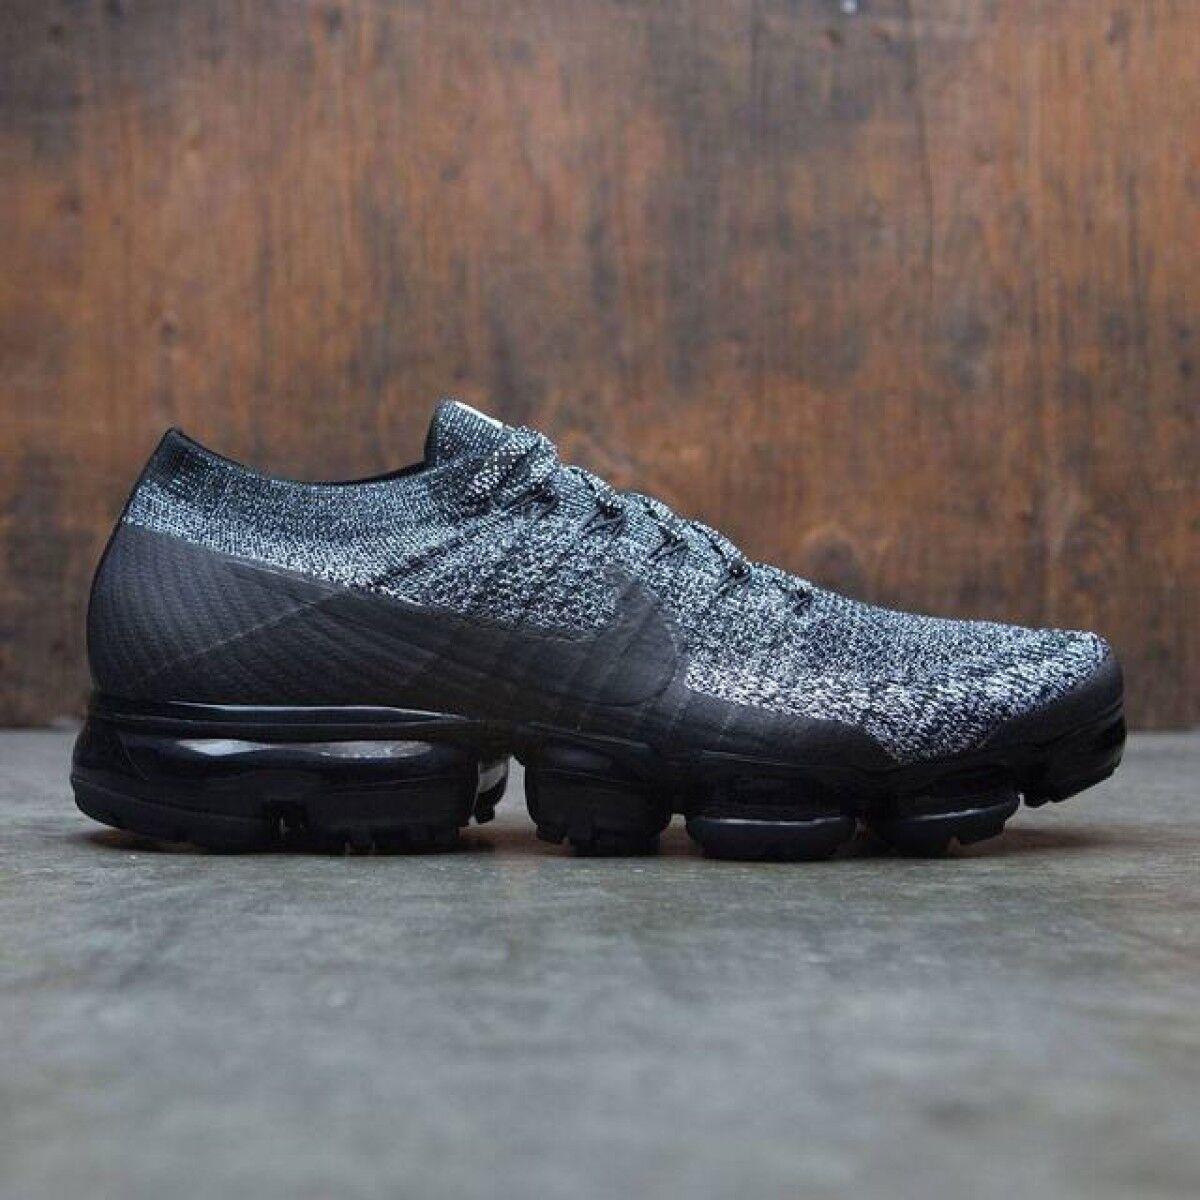 Nike Vapormax Flyknit Black White Oreo Size 7.5. 849558-041 air max 2018 90 97